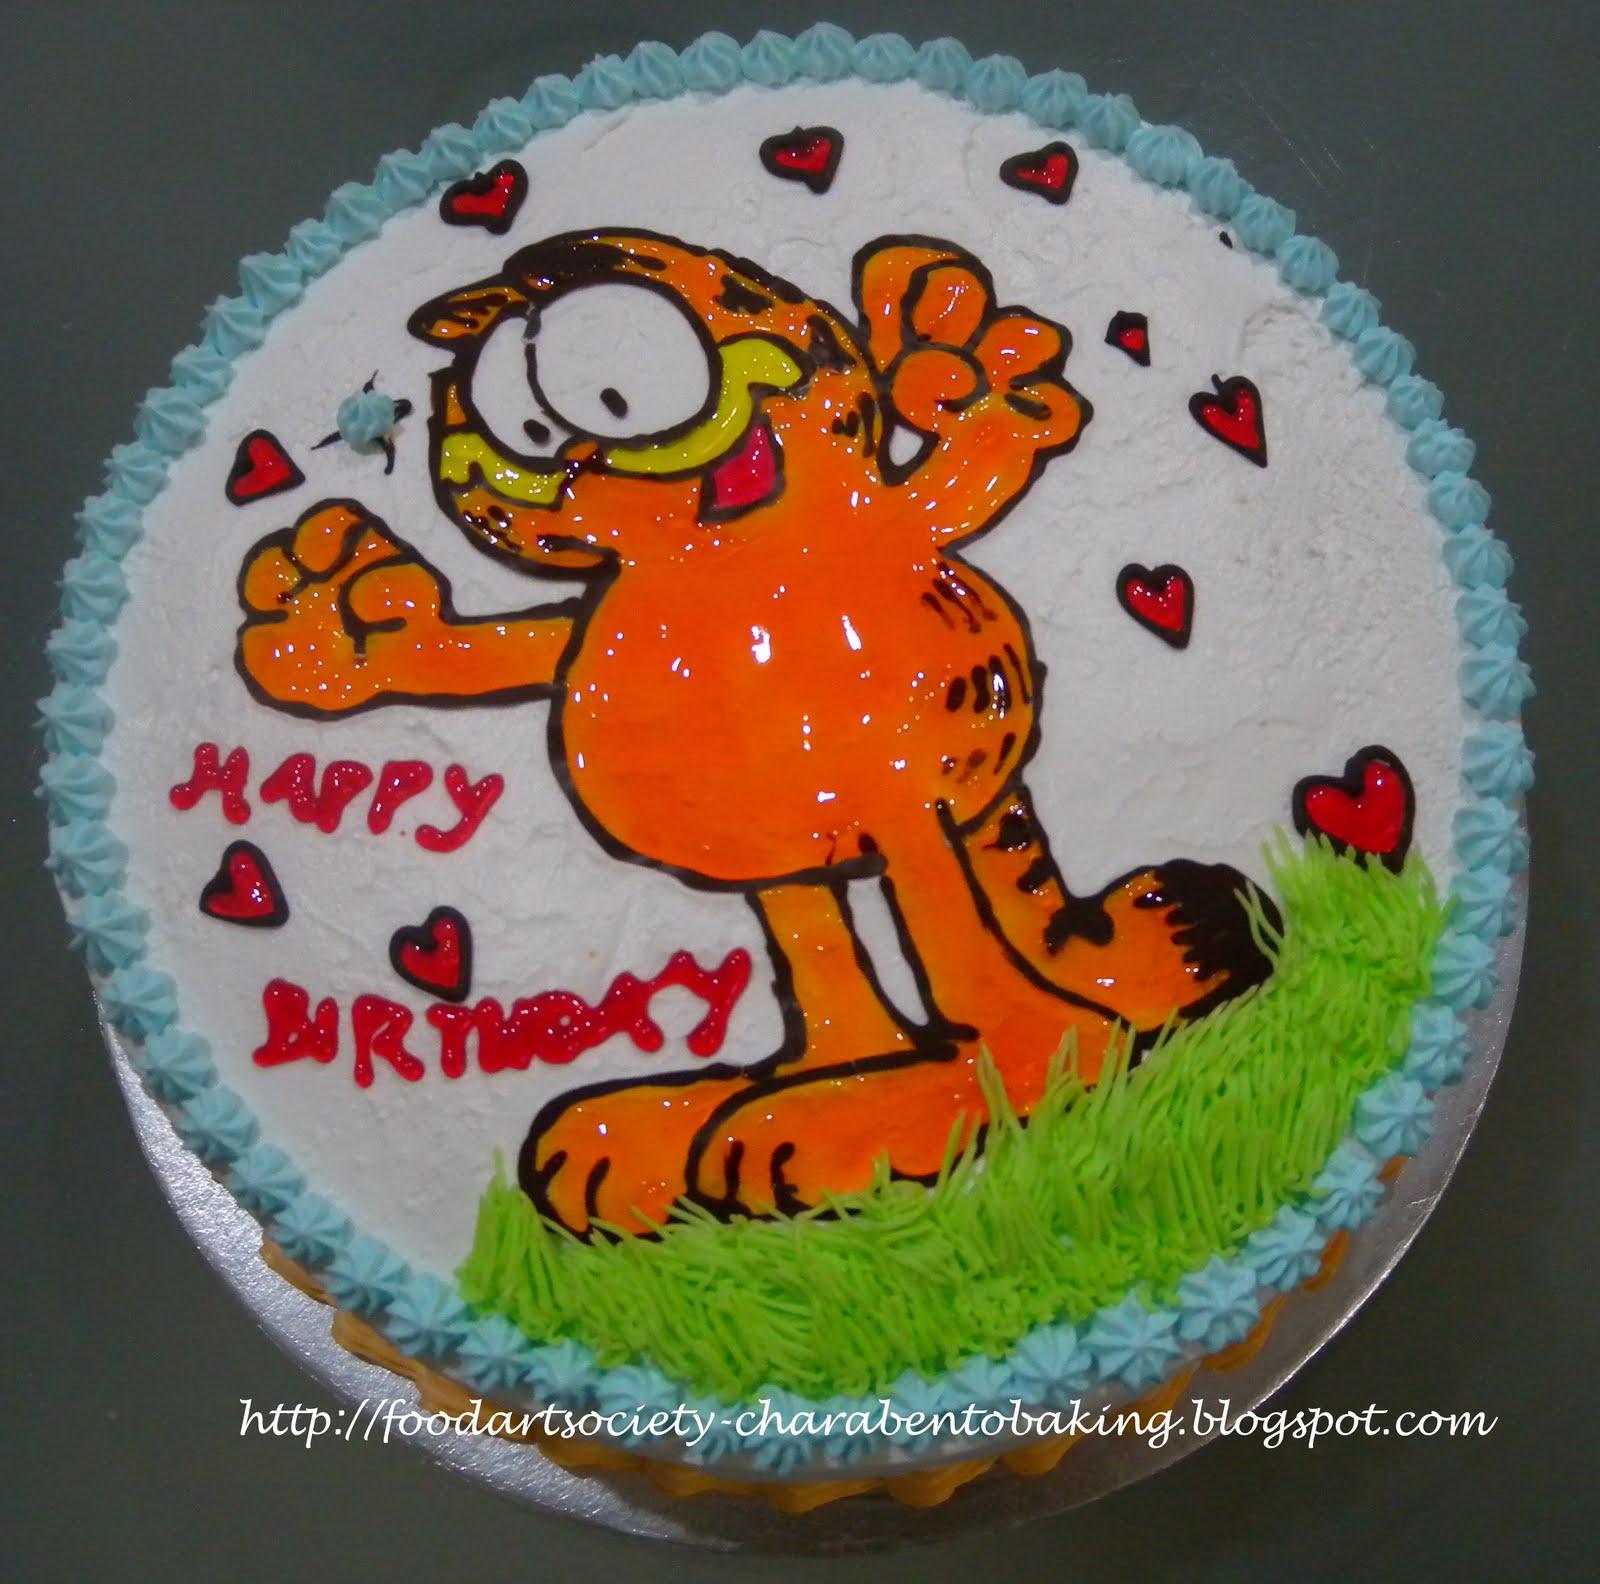 Food Art Society Charabento Amp Baking Garfield Cake 加菲猫蛋糕